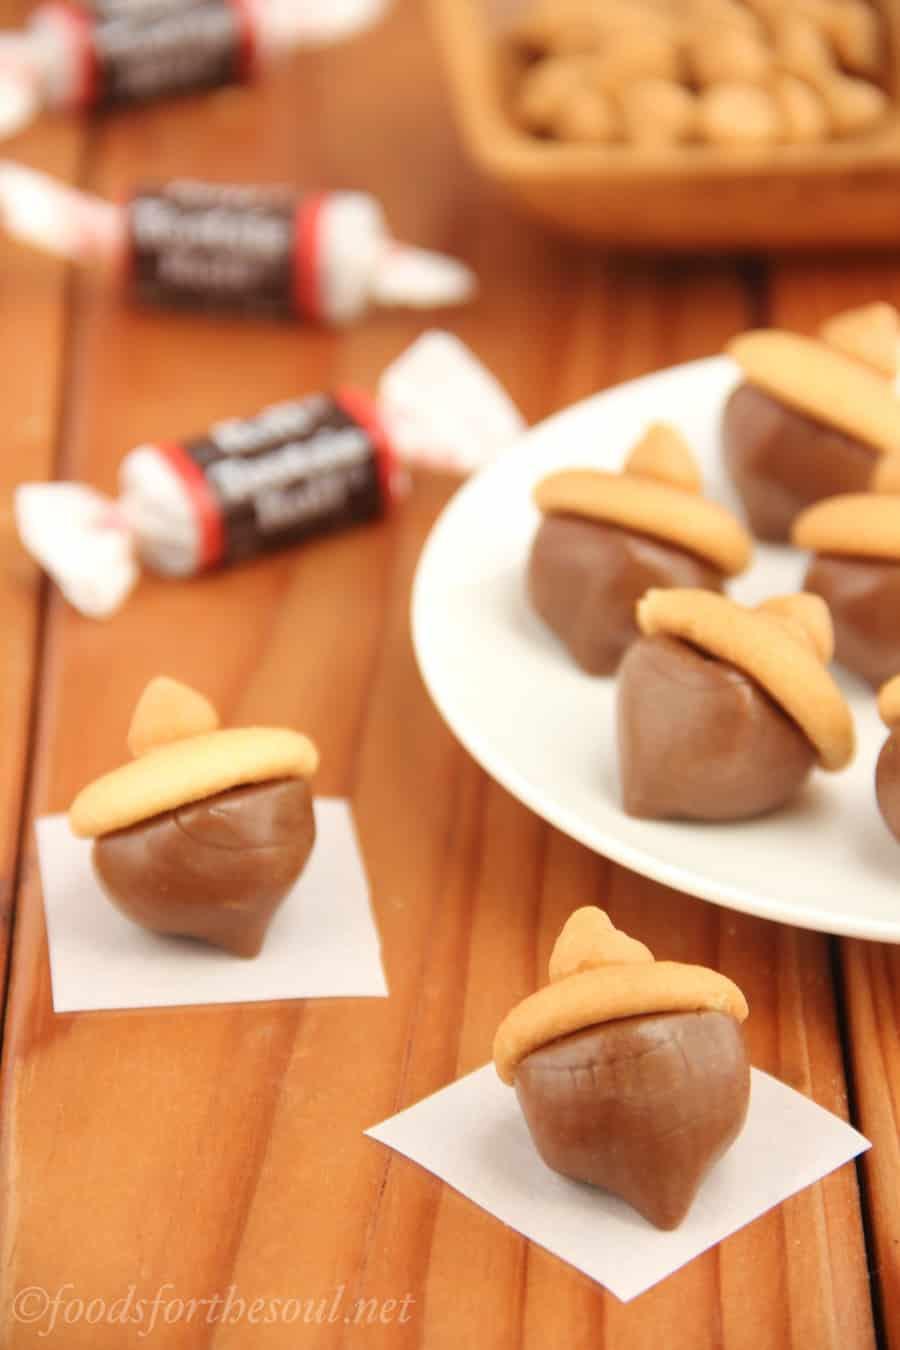 Tootsie Roll acorns